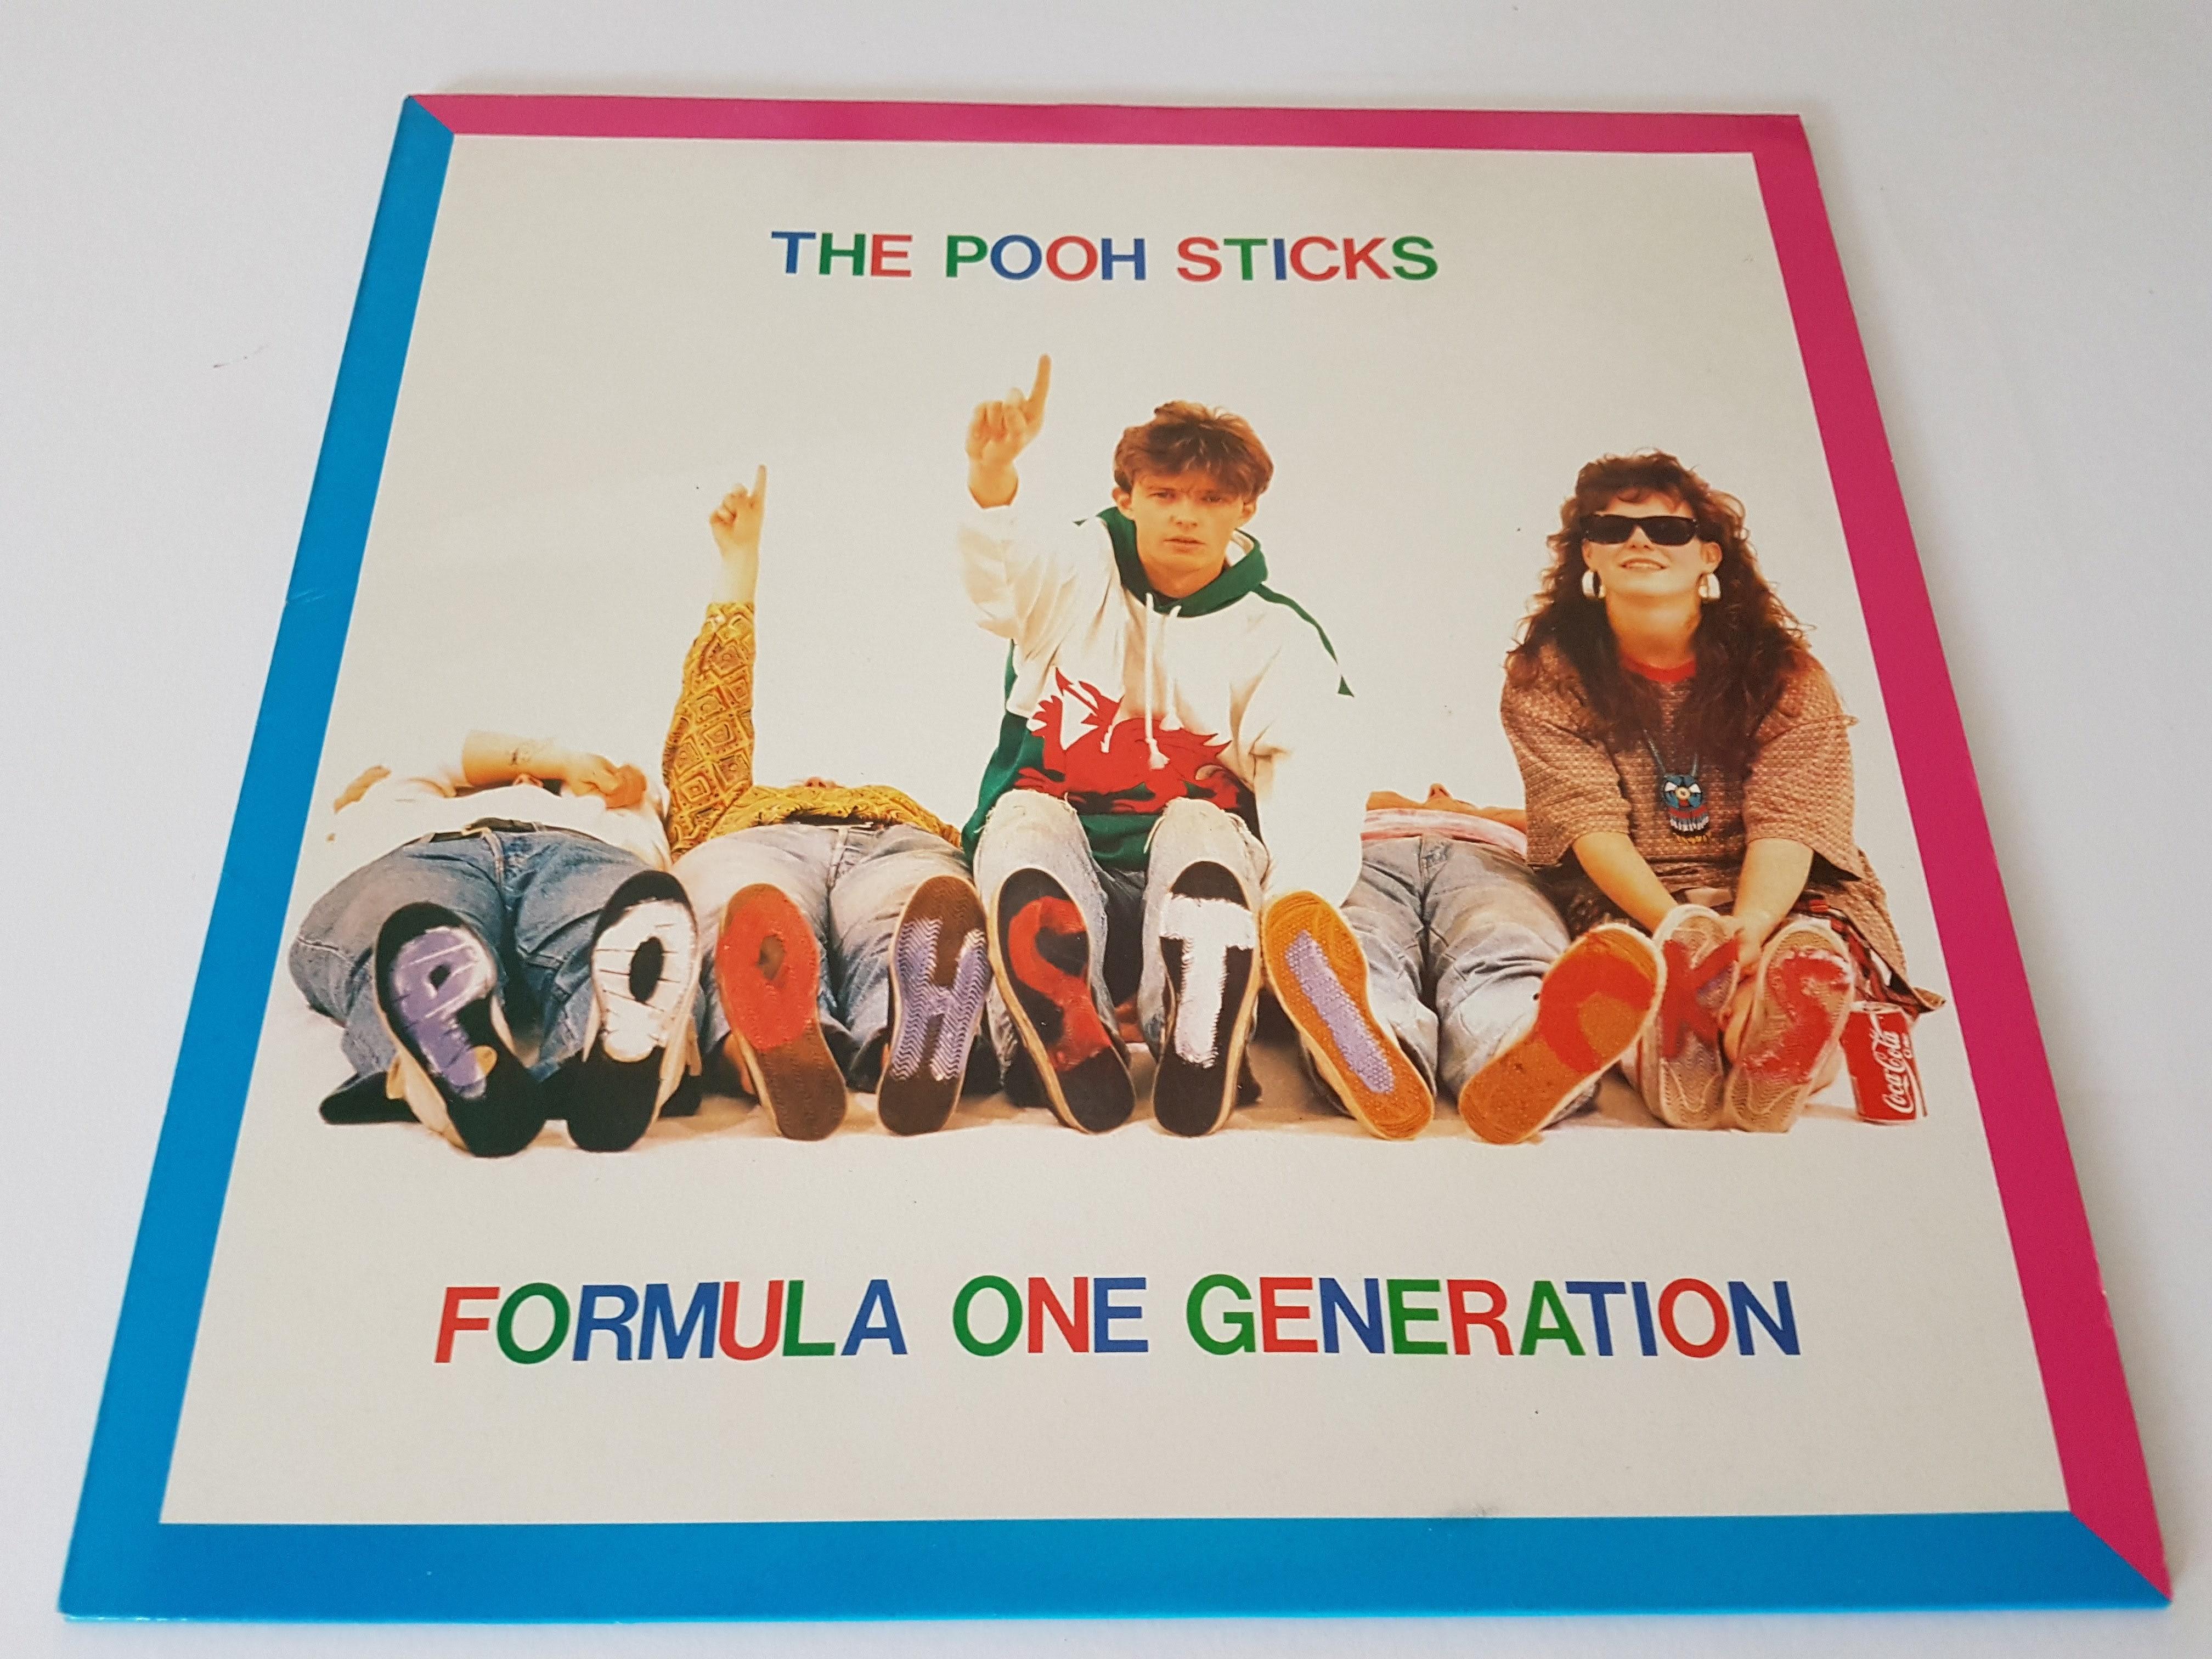 The Pooh Sticks - Formula One Generation